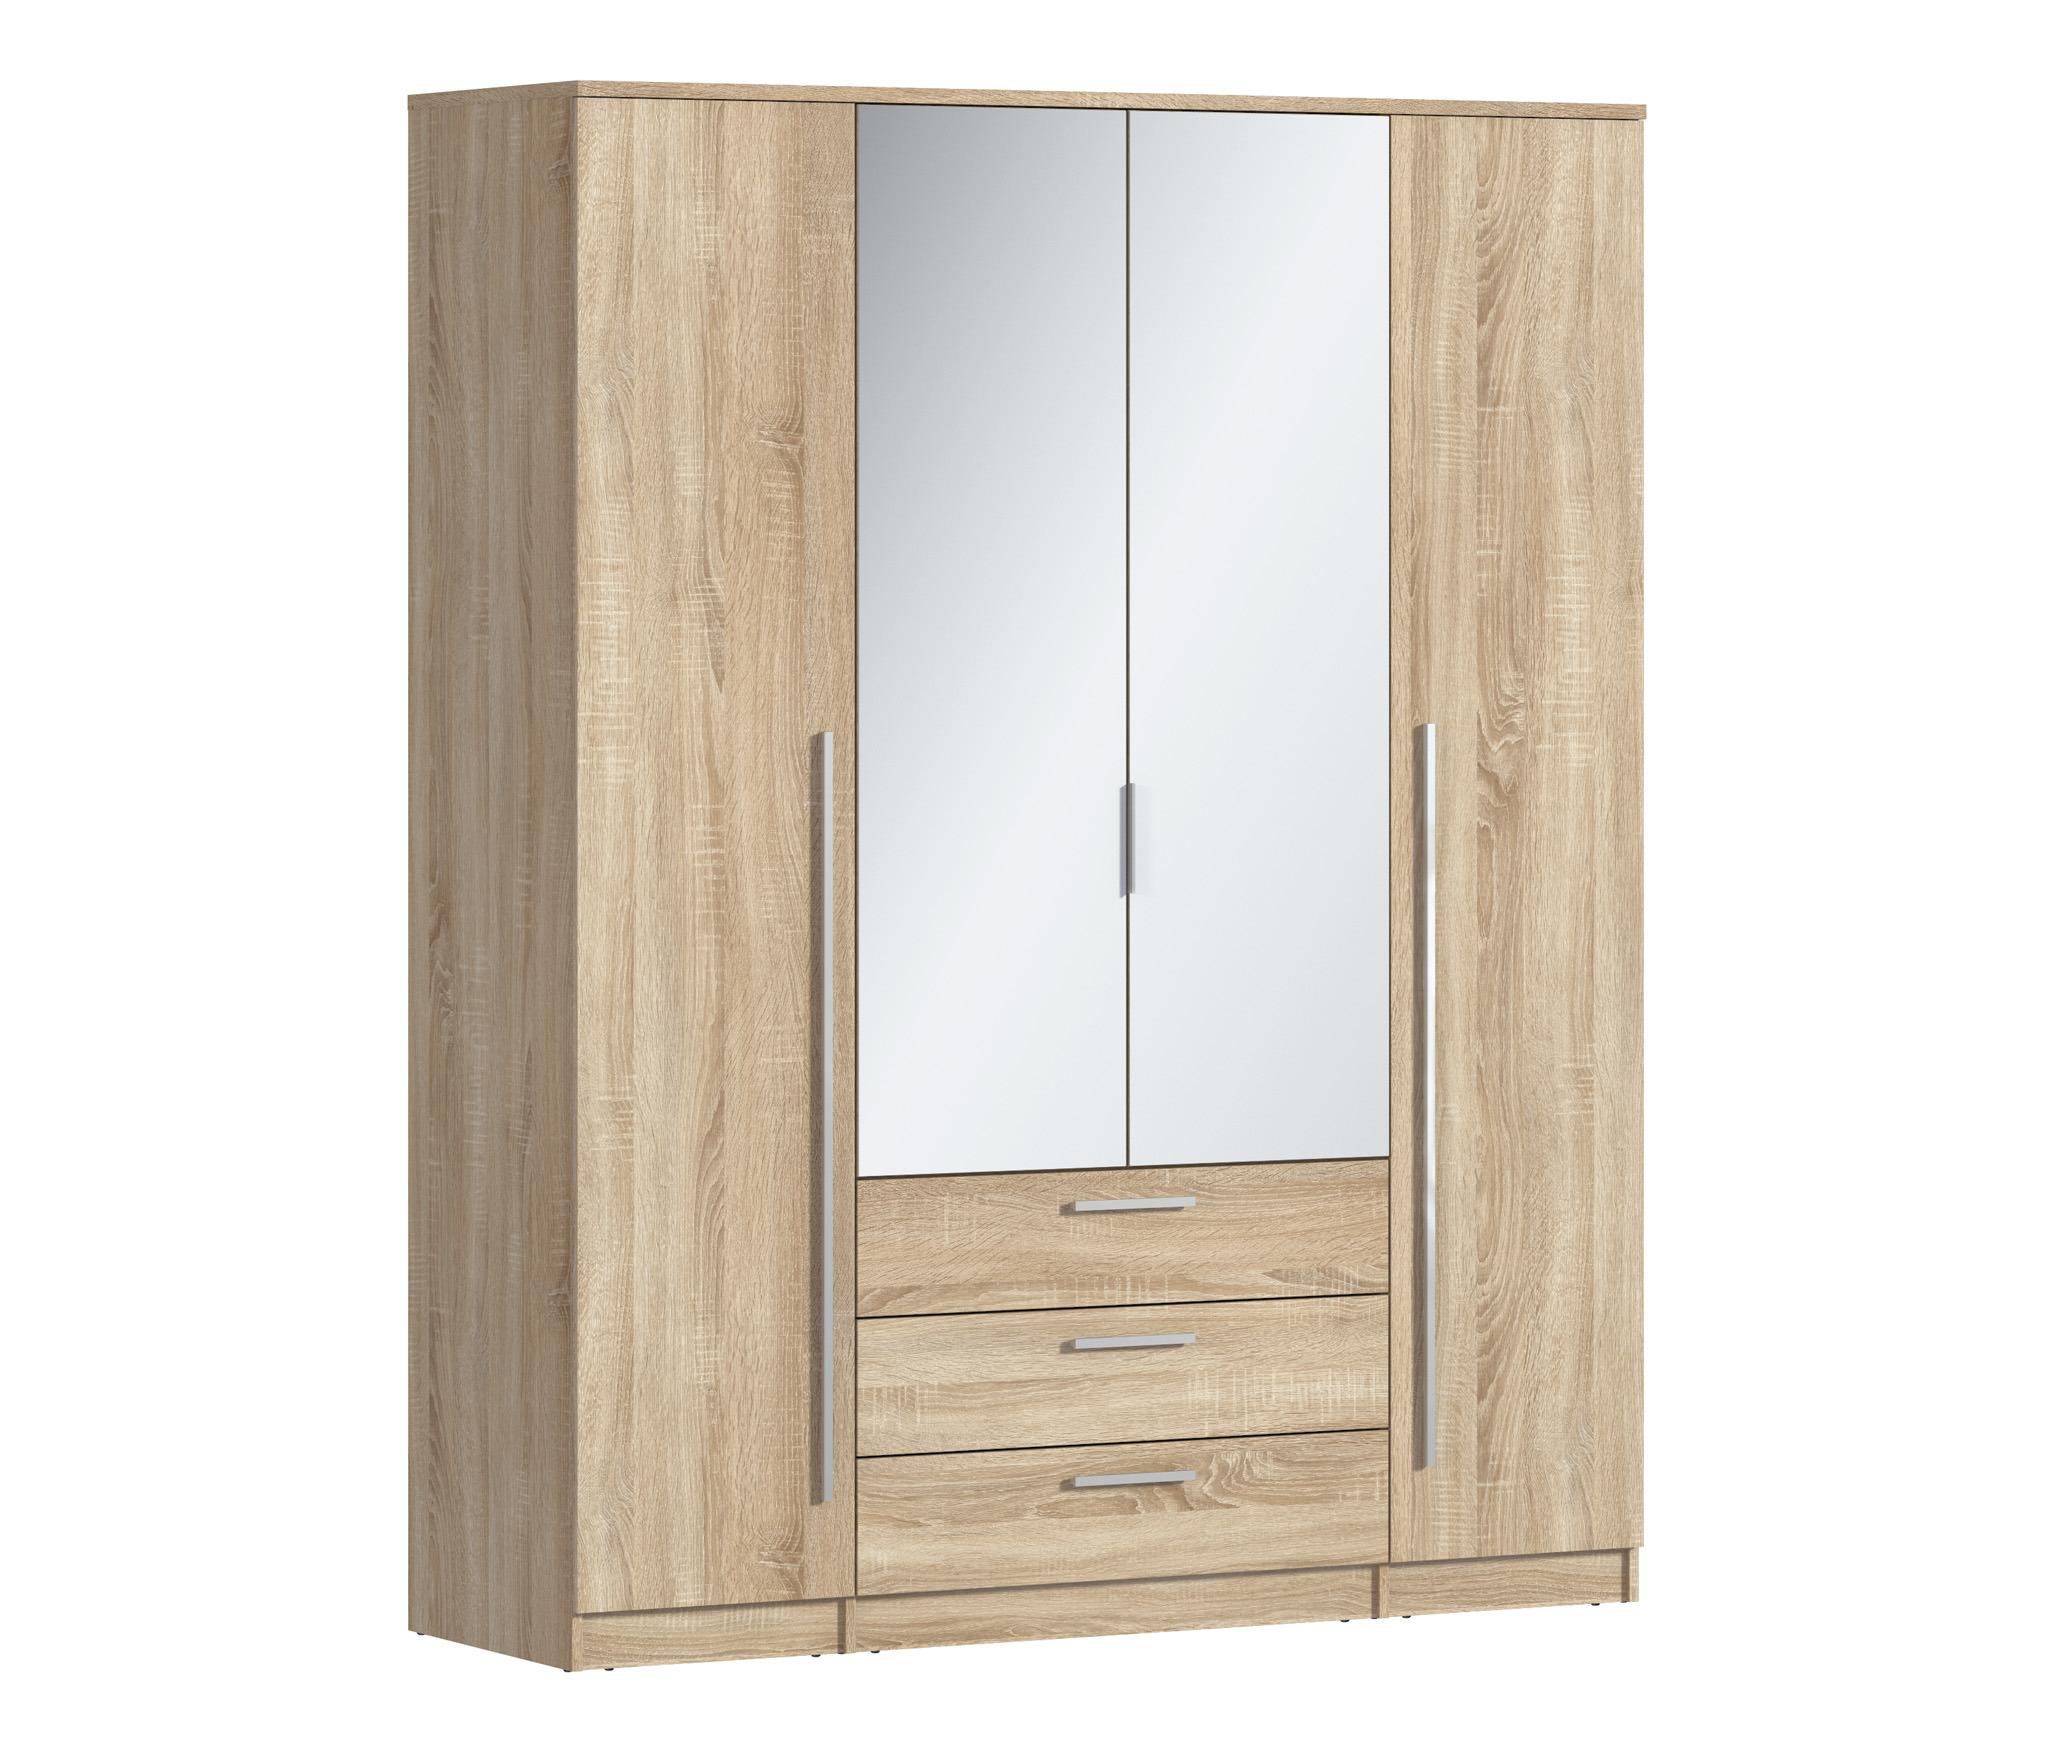 Николь СБ-2595 Шкаф 4-х дверный